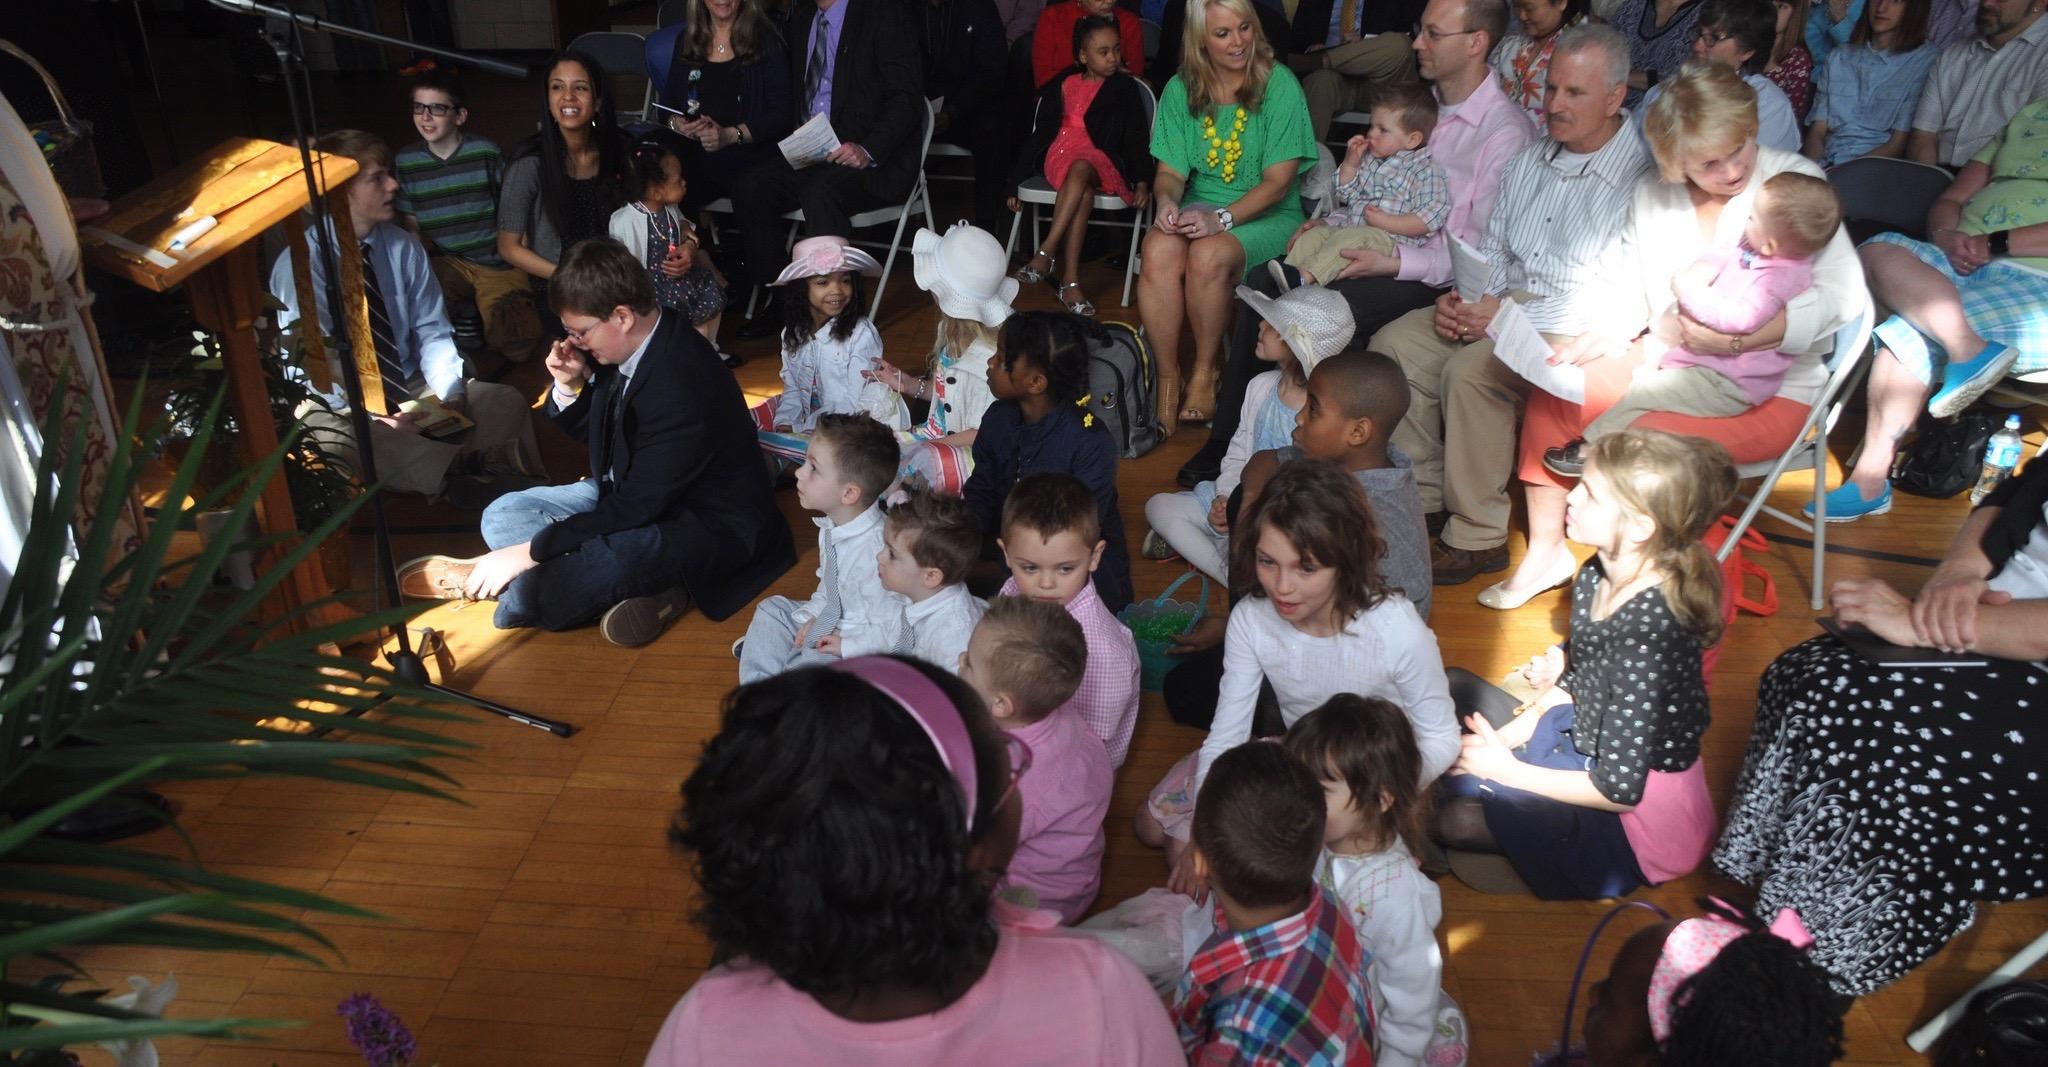 Children gathered for worship, Easter Sunday